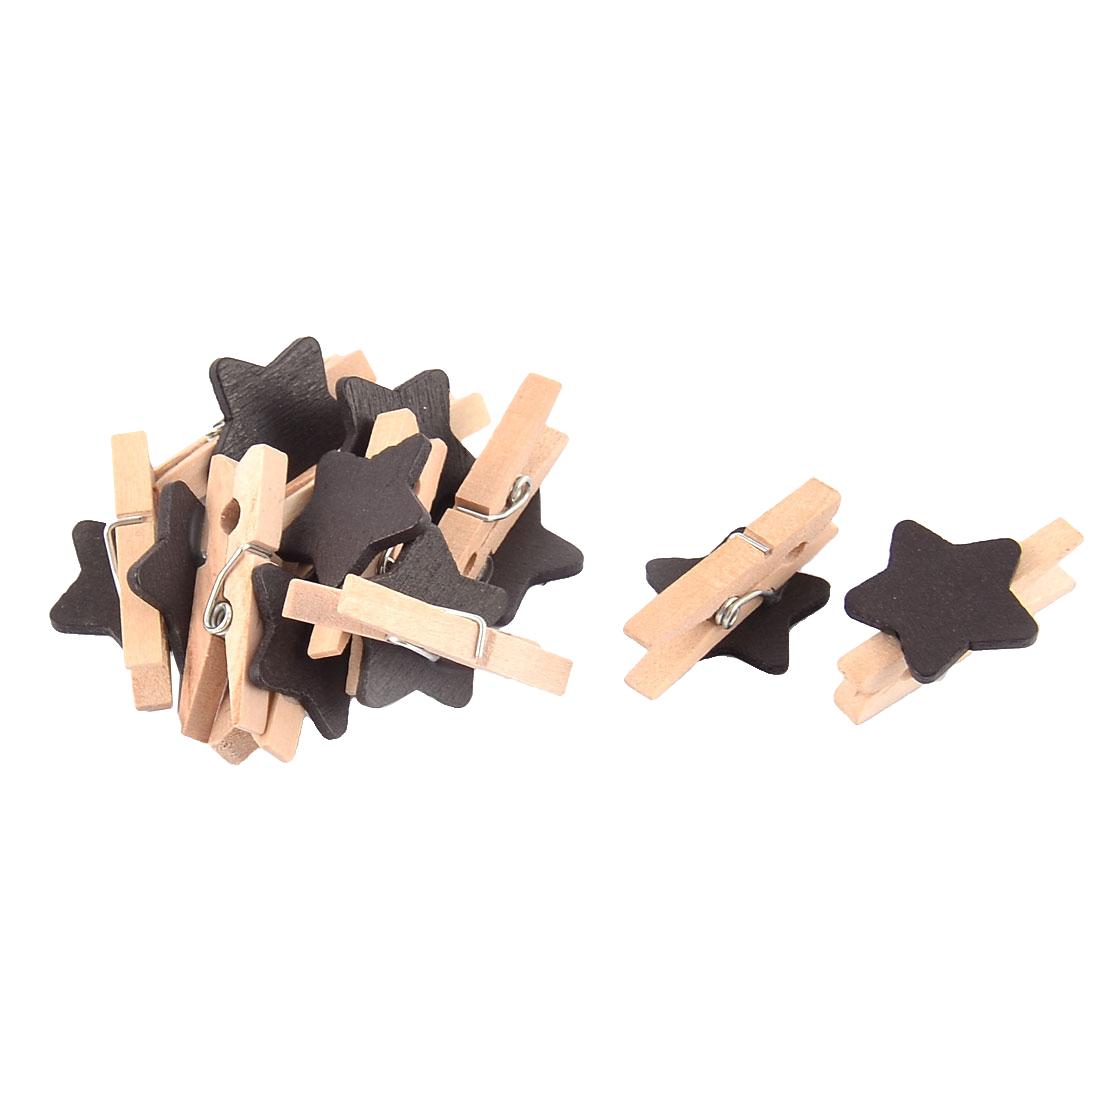 Star Shaped Card Photo Clothes Pegs Craft Mini Wooden Clip Black 10pcs